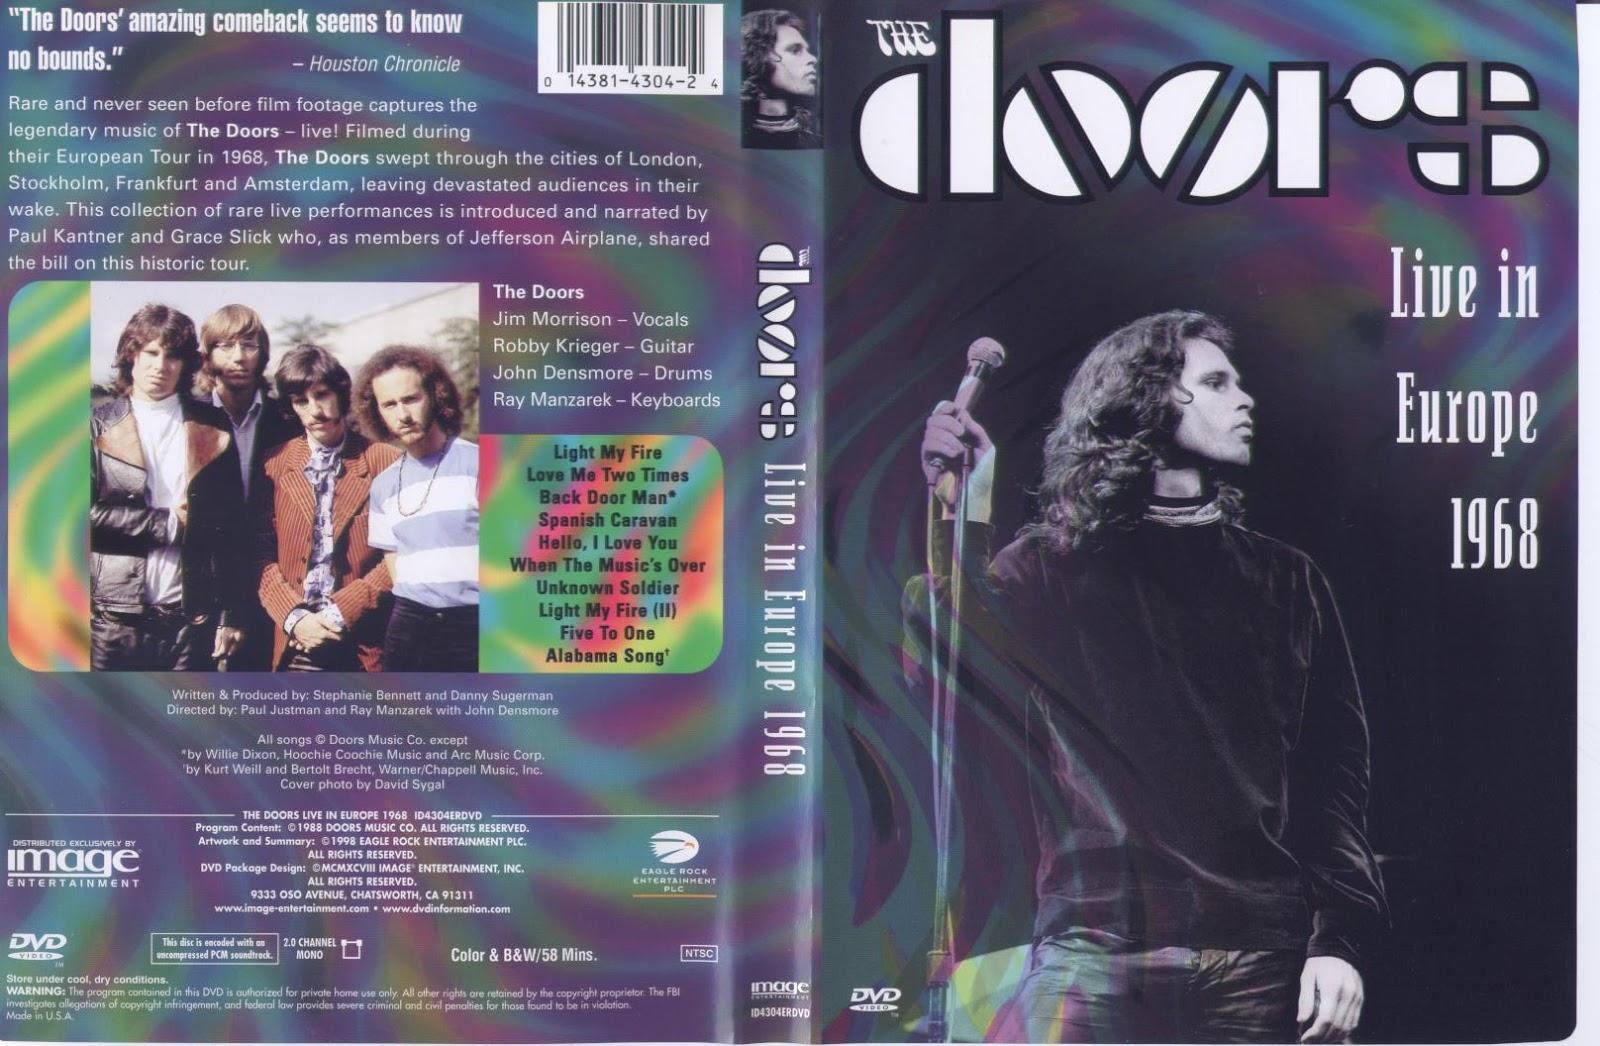 The Doors - Live In Europa 1968  sc 1 st  Catálogo Dvd Música & Catálogo Dvd Música: The Doors - Live In Europa 1968